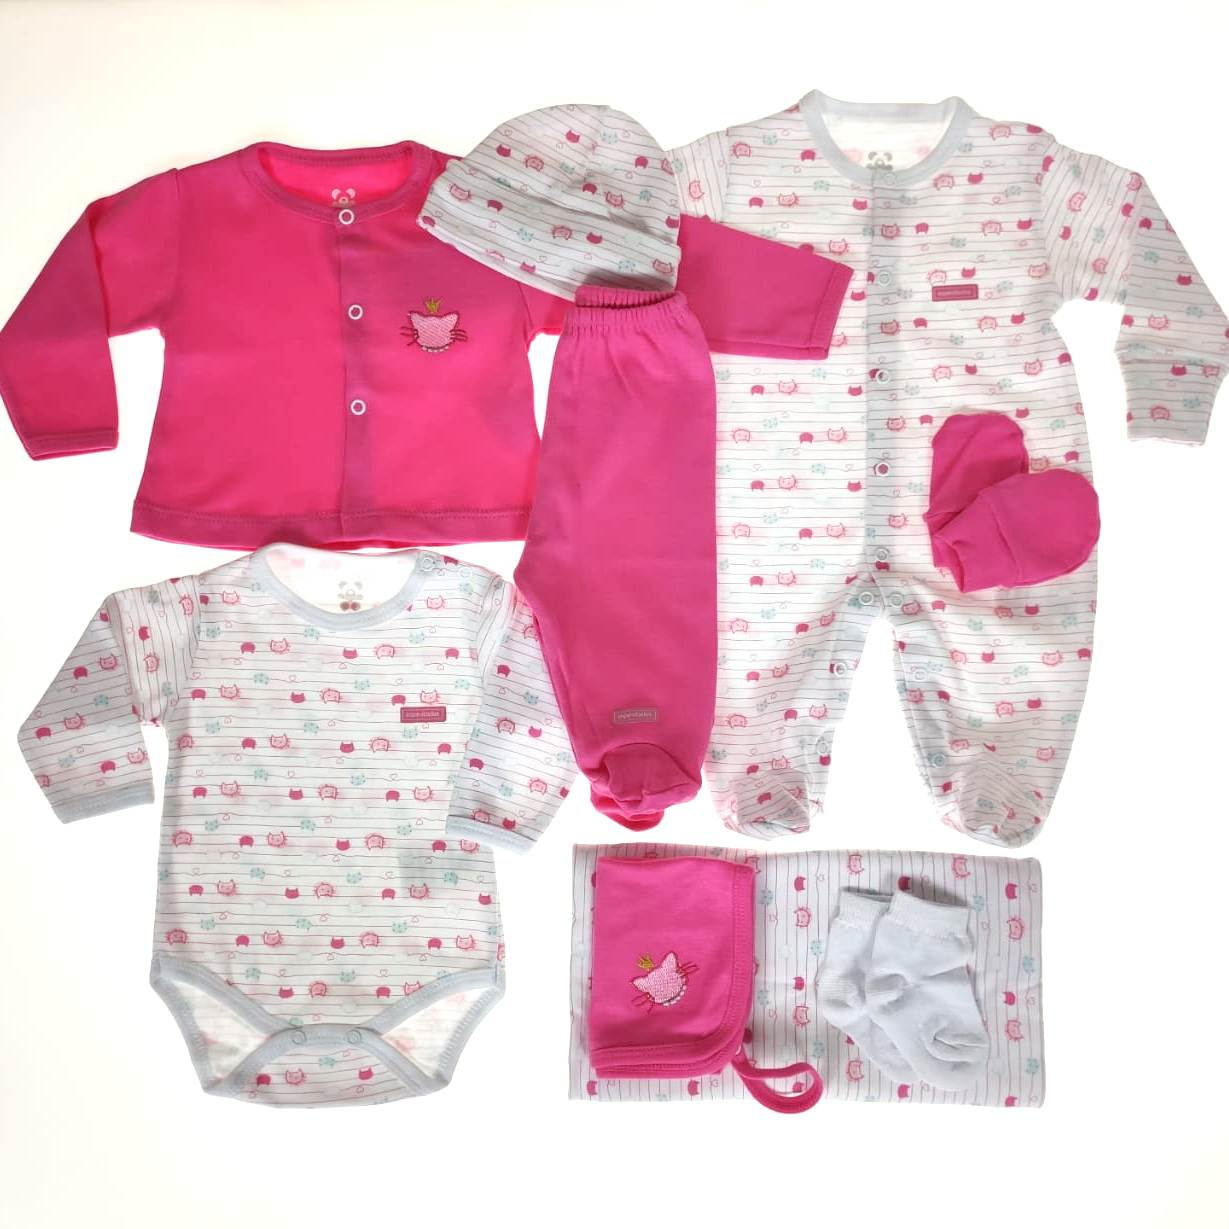 Kit Saída Maternidade Pink e Branco- 9 Peças